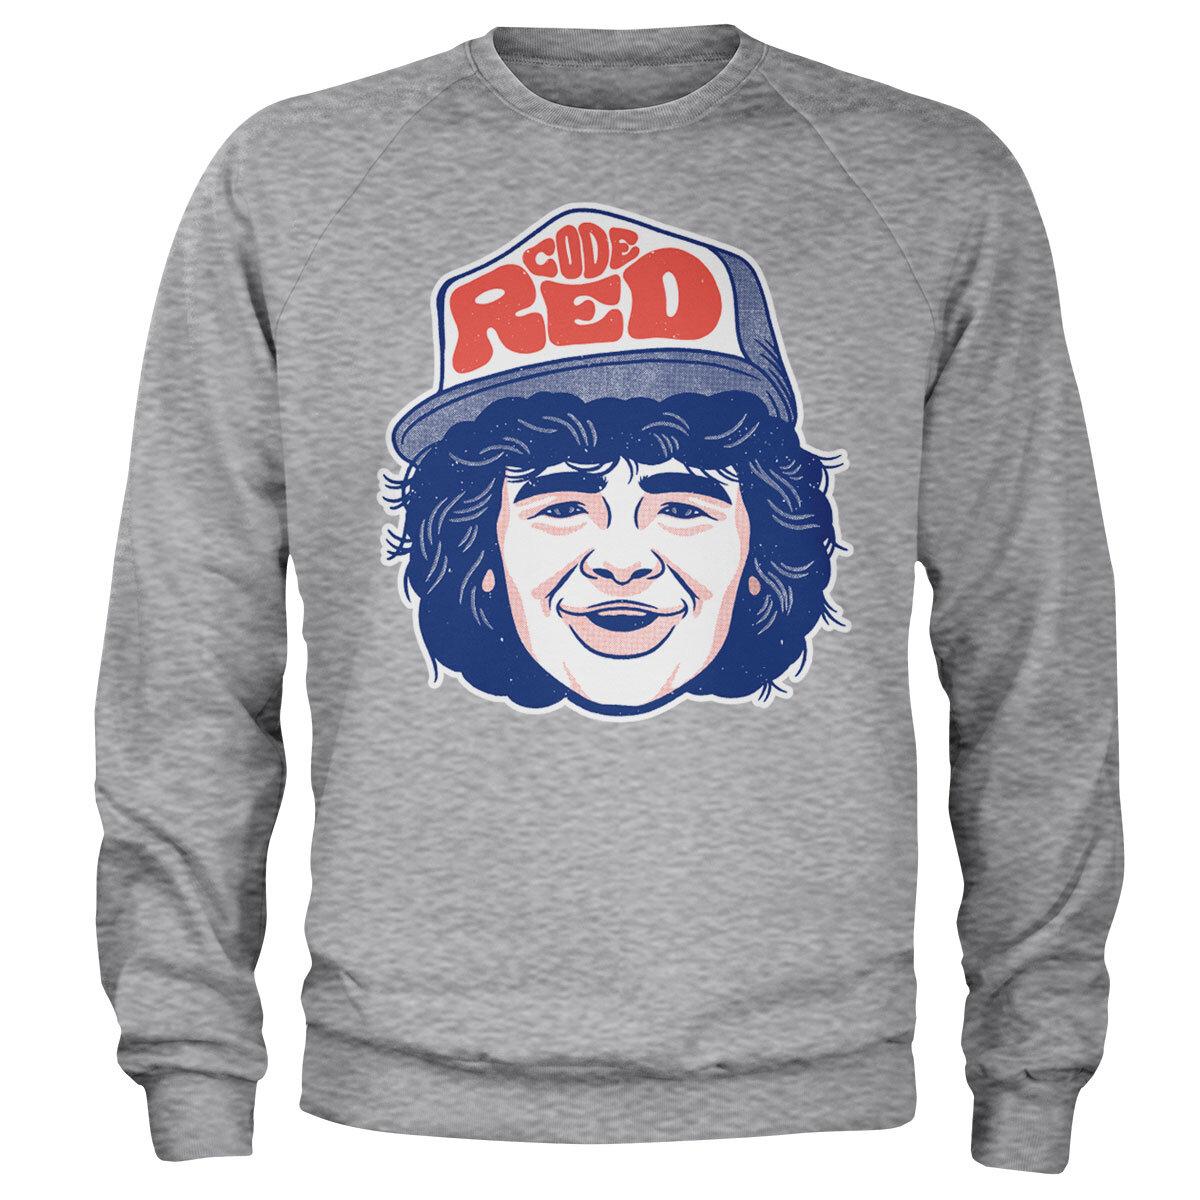 Dustin Code Red Sweatshirt